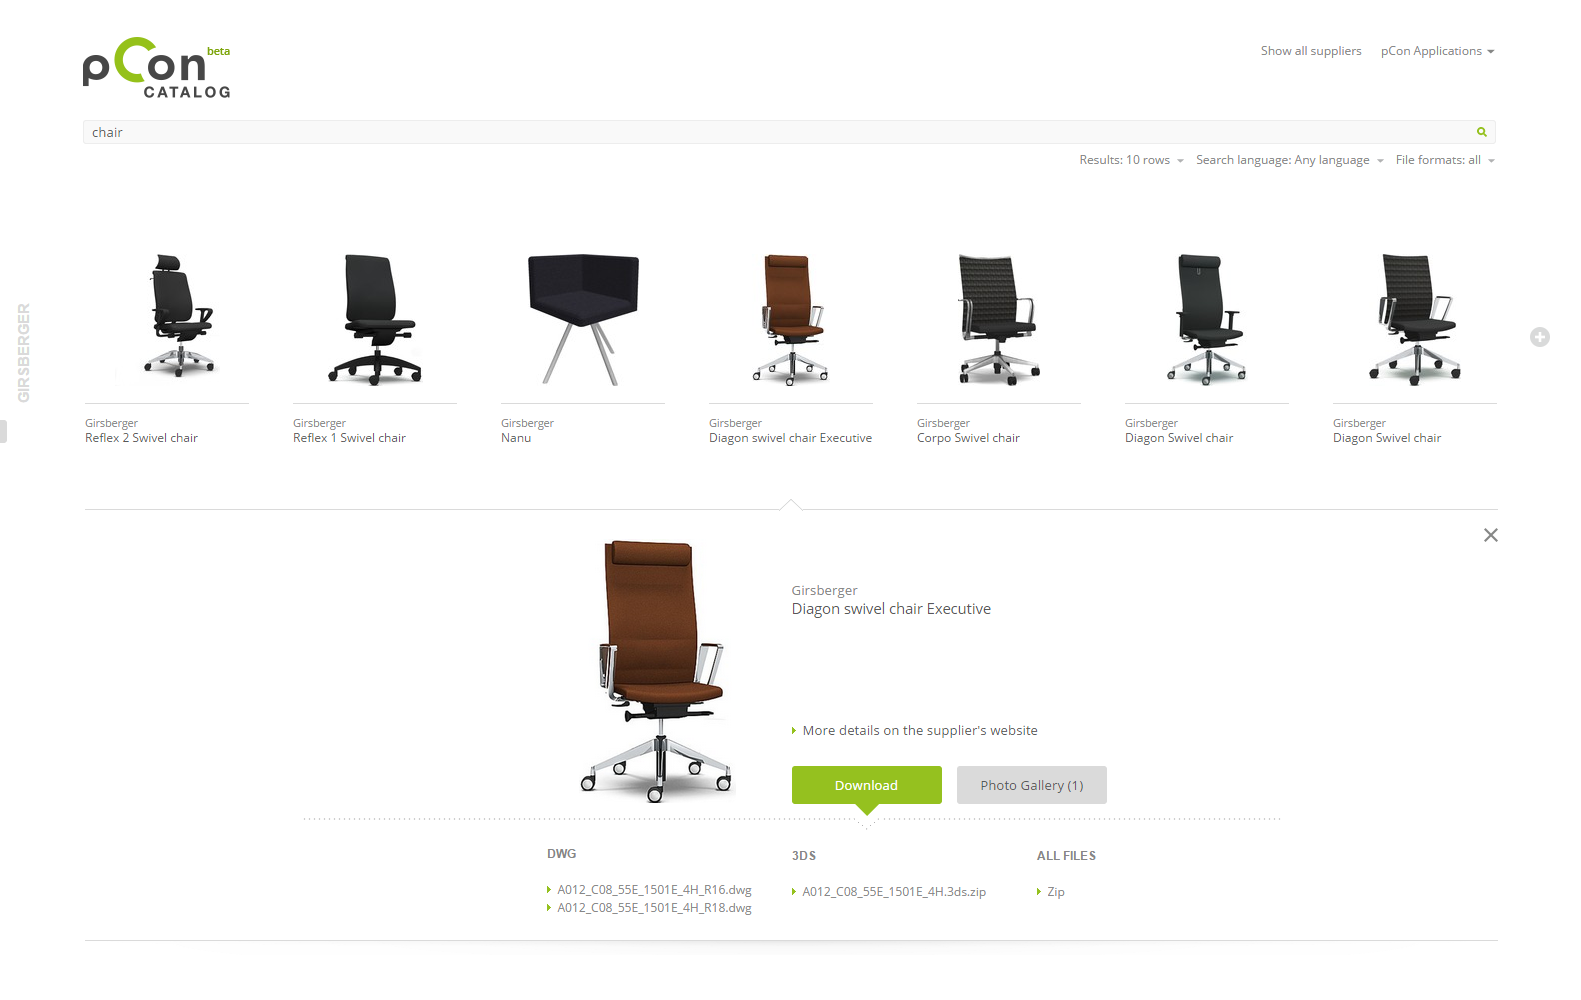 New pCon.catalog portal now online